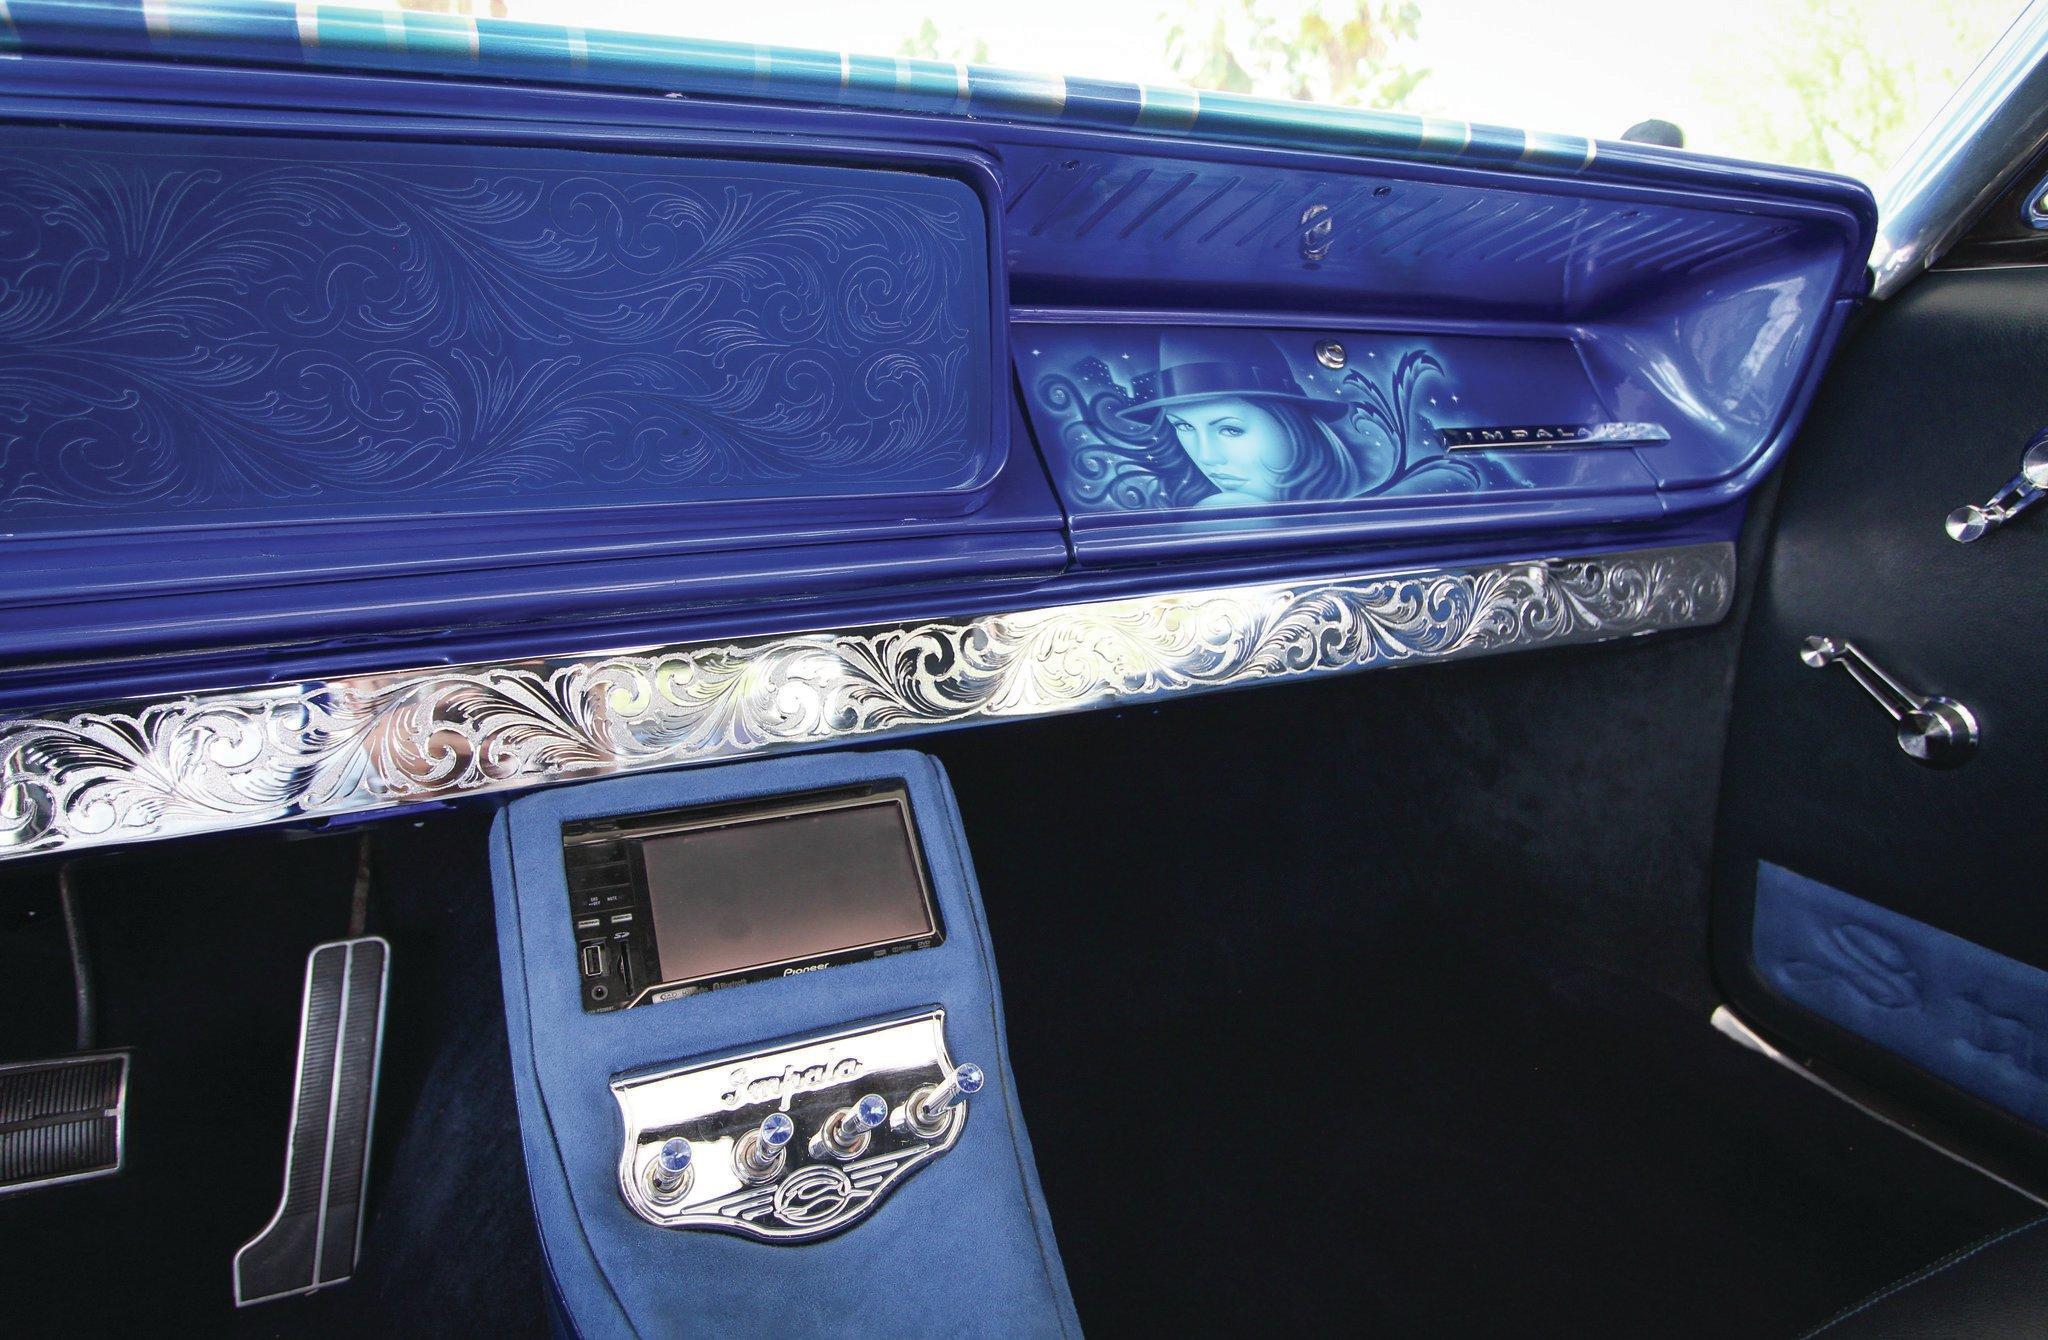 Ford Thunderbird Convertible Rhd besides Mayberrypd likewise Dc Ec B D Bc E D Ce E A E Rusty Cars Iron furthermore Singlespeedwiperswitch furthermore Lowrider Girl Priscilla Reyes. on 1957 chevy chevrolet impala